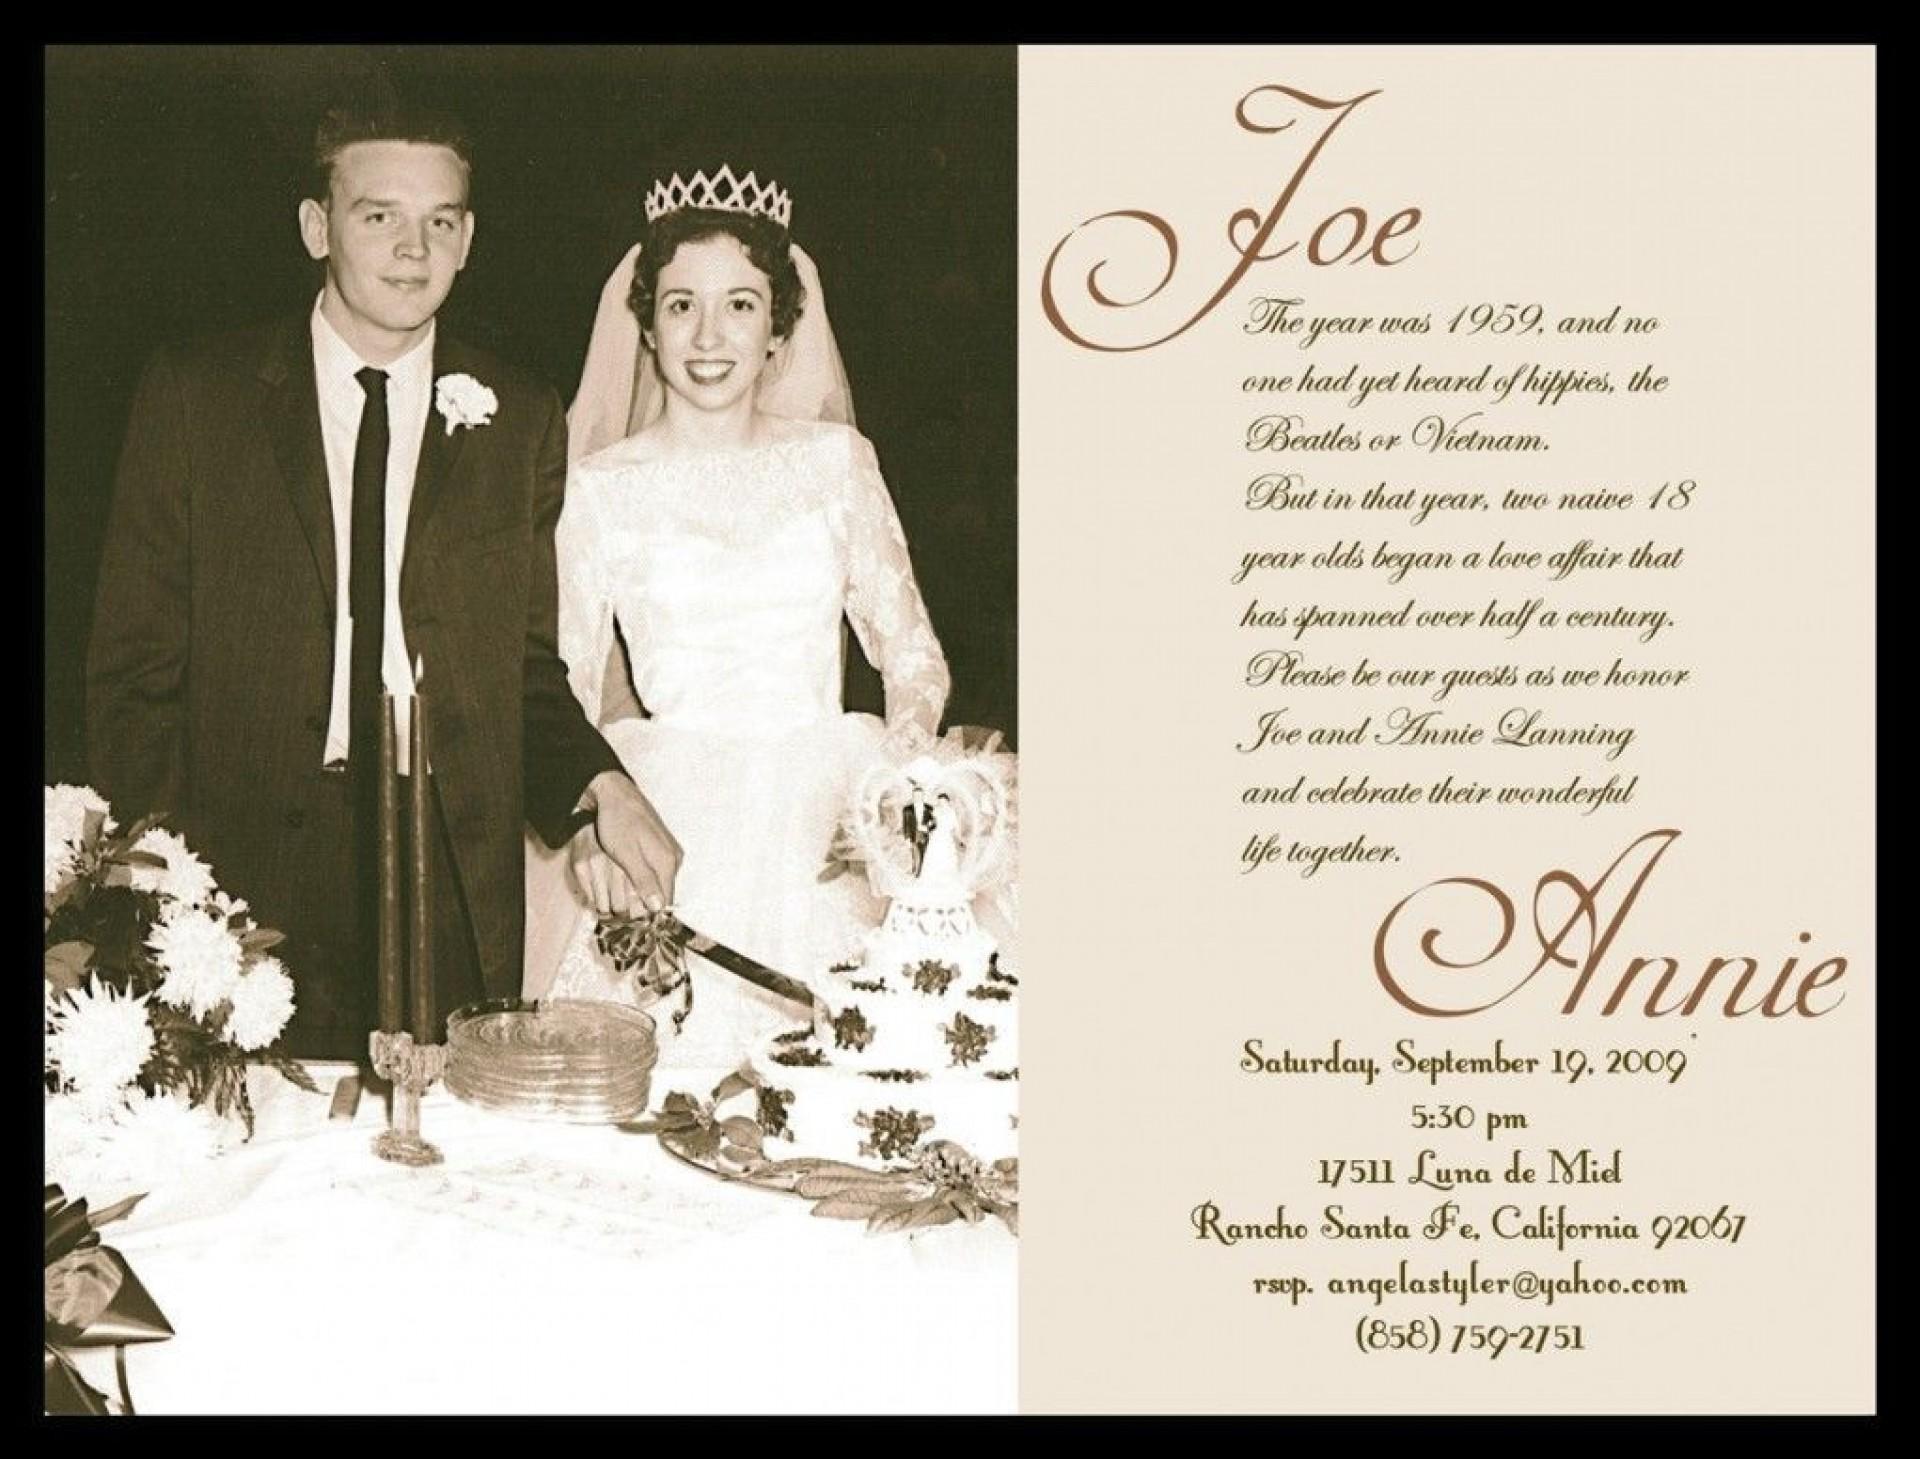 008 Stupendou 50th Anniversary Invitation Template Free Photo  Download Golden Wedding1920